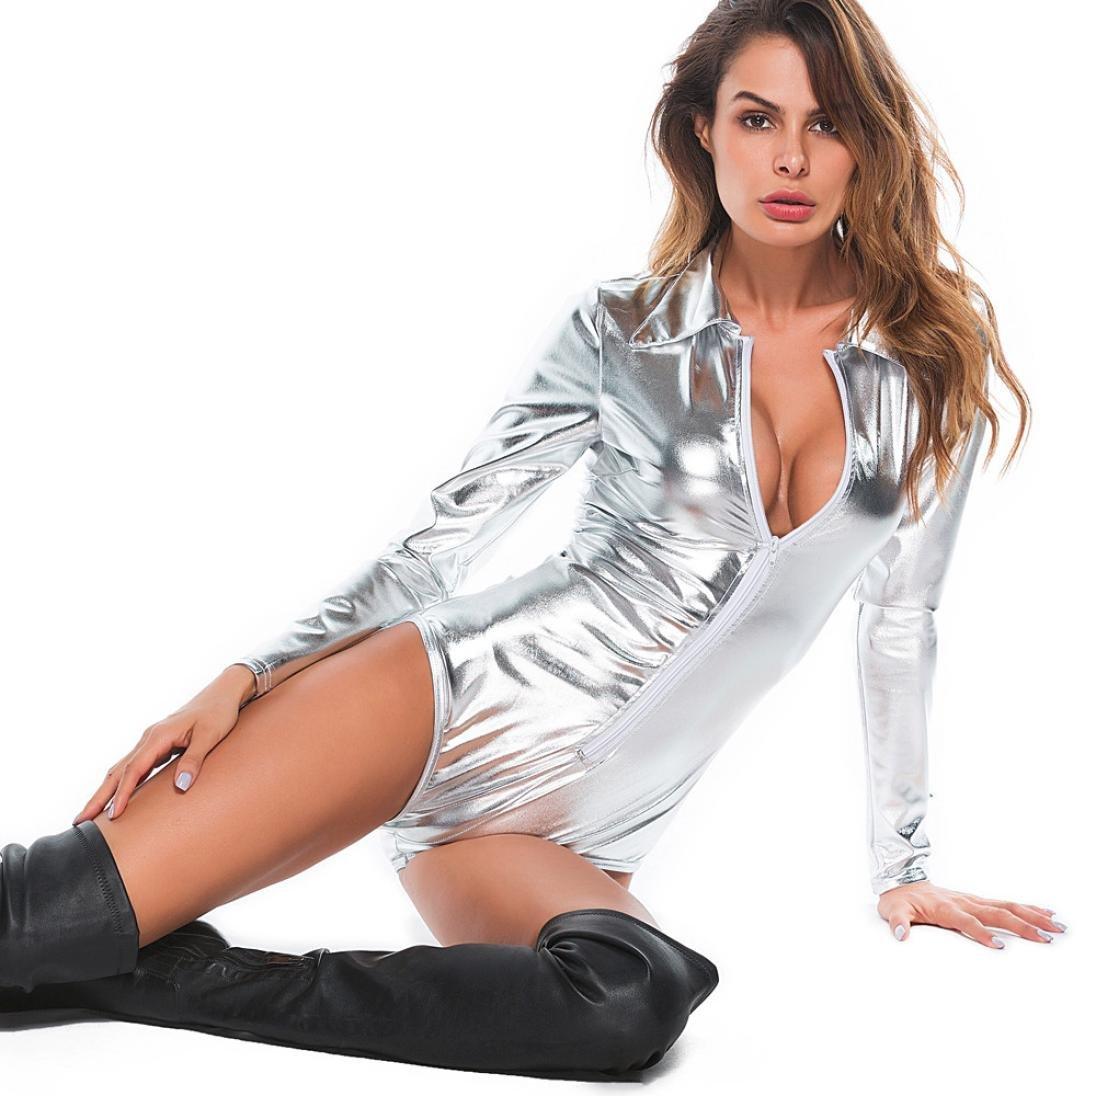 Amazon.com: Vovotrade Women Lingerie Set Sexy V Neck Clubwear PU Leather Siamese Underwear Bodysuit Alluring Intimates: Clothing